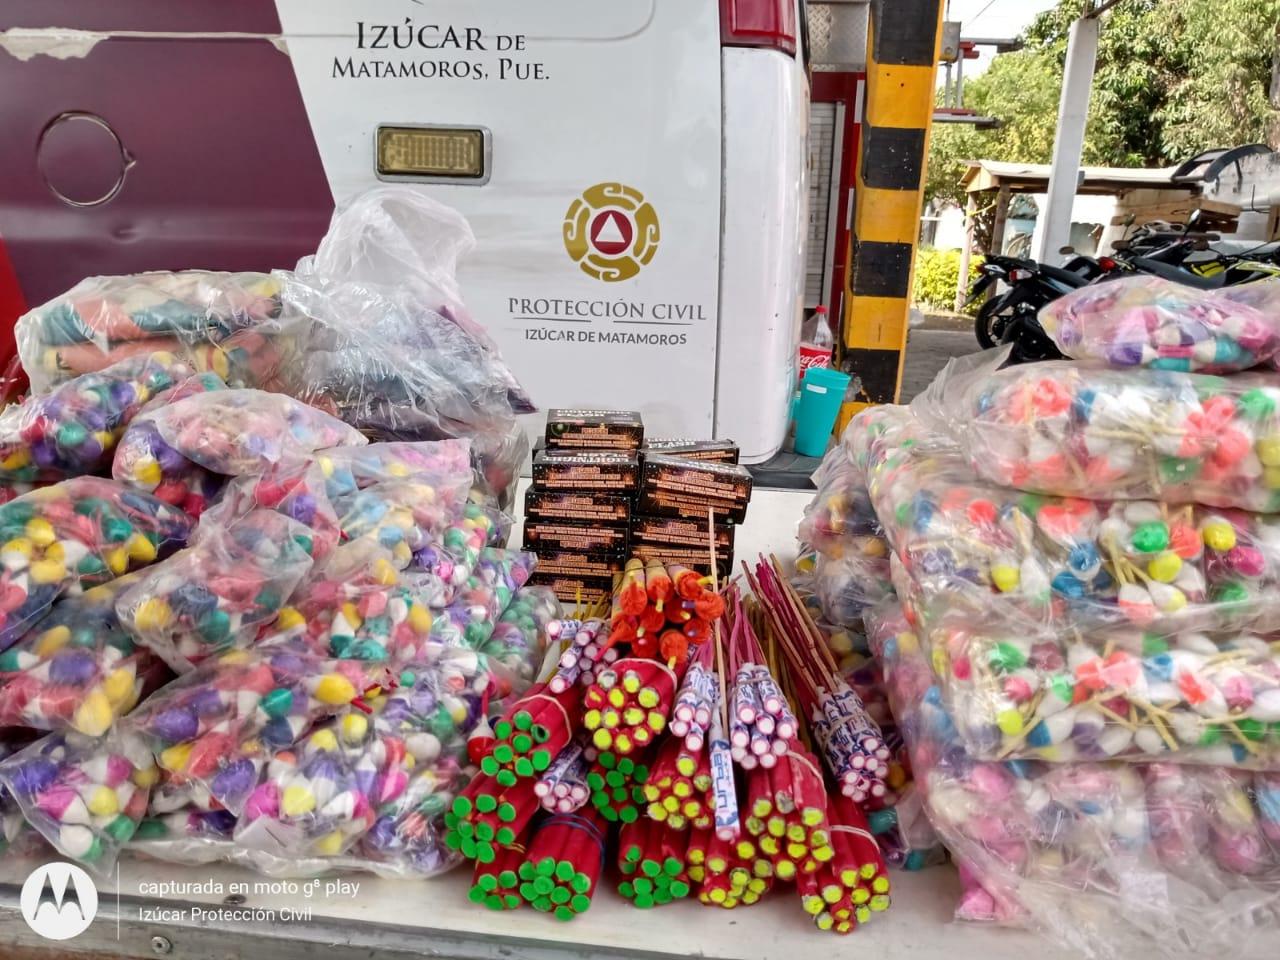 Decomisan 80 kilos de pirotecnia en Izúcar